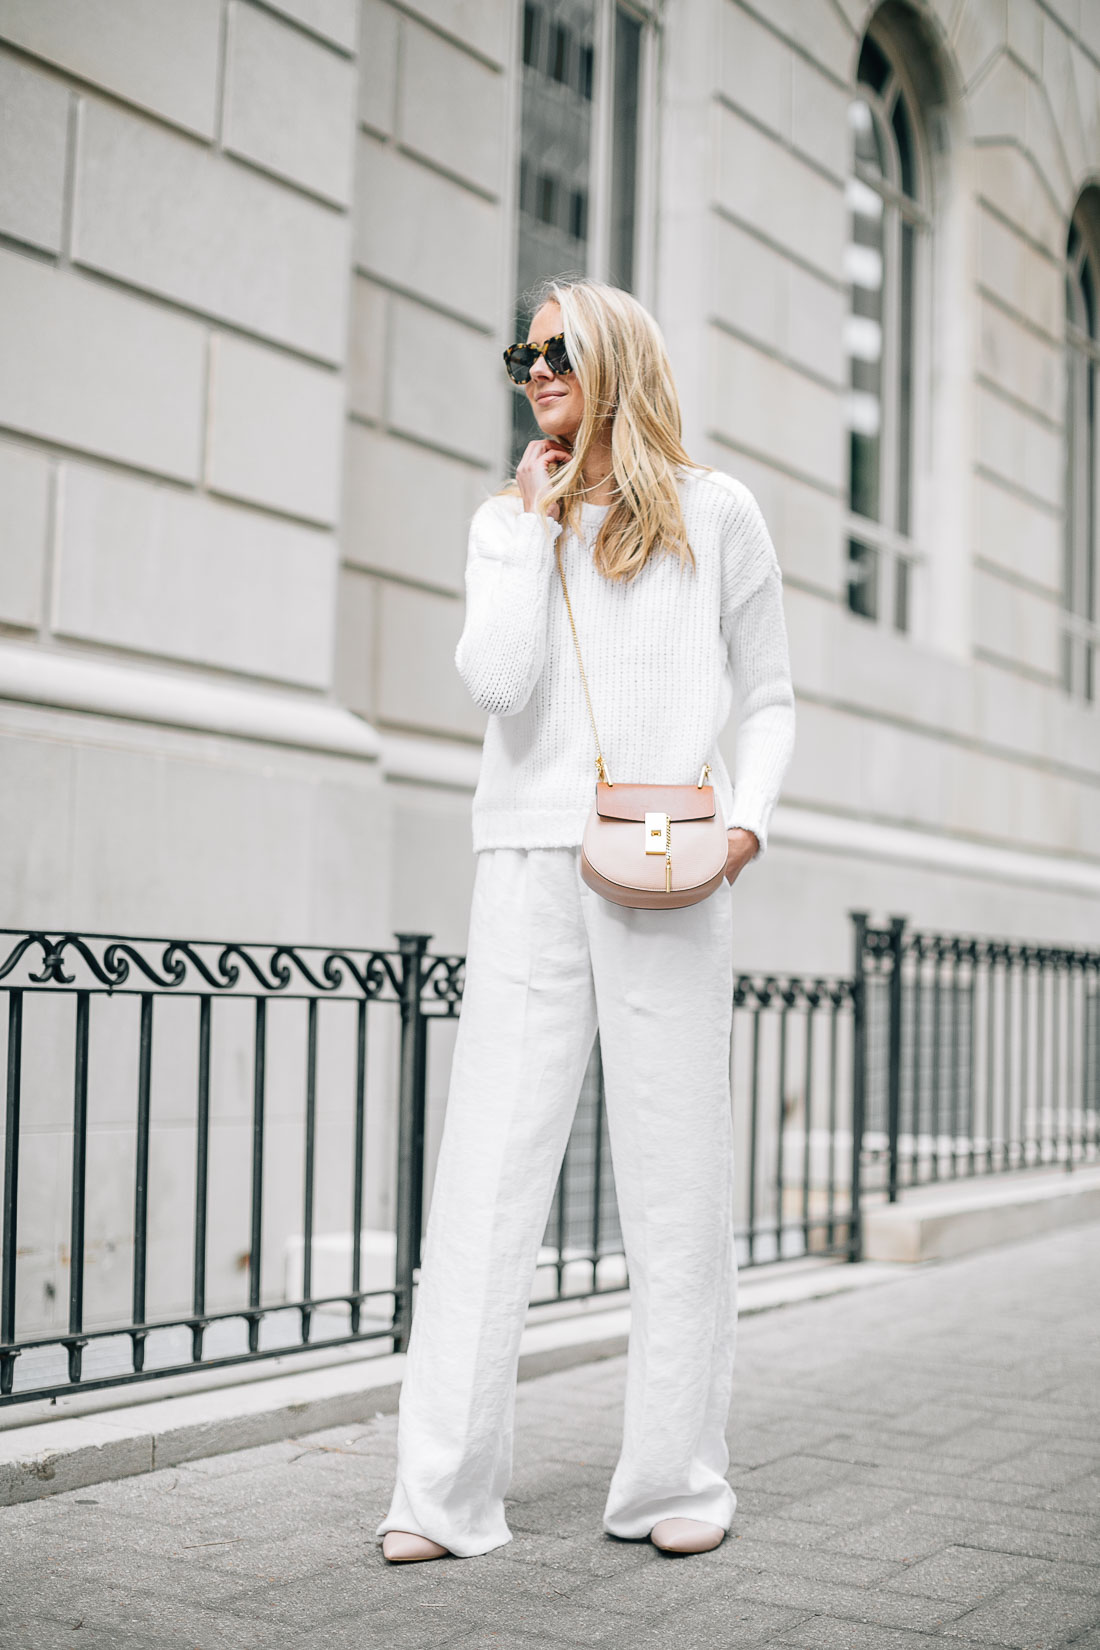 fashion-jackson-loft-springstich-white-sweater-white-wide-leg-pants-pink-flats-chloe-drew-handbag